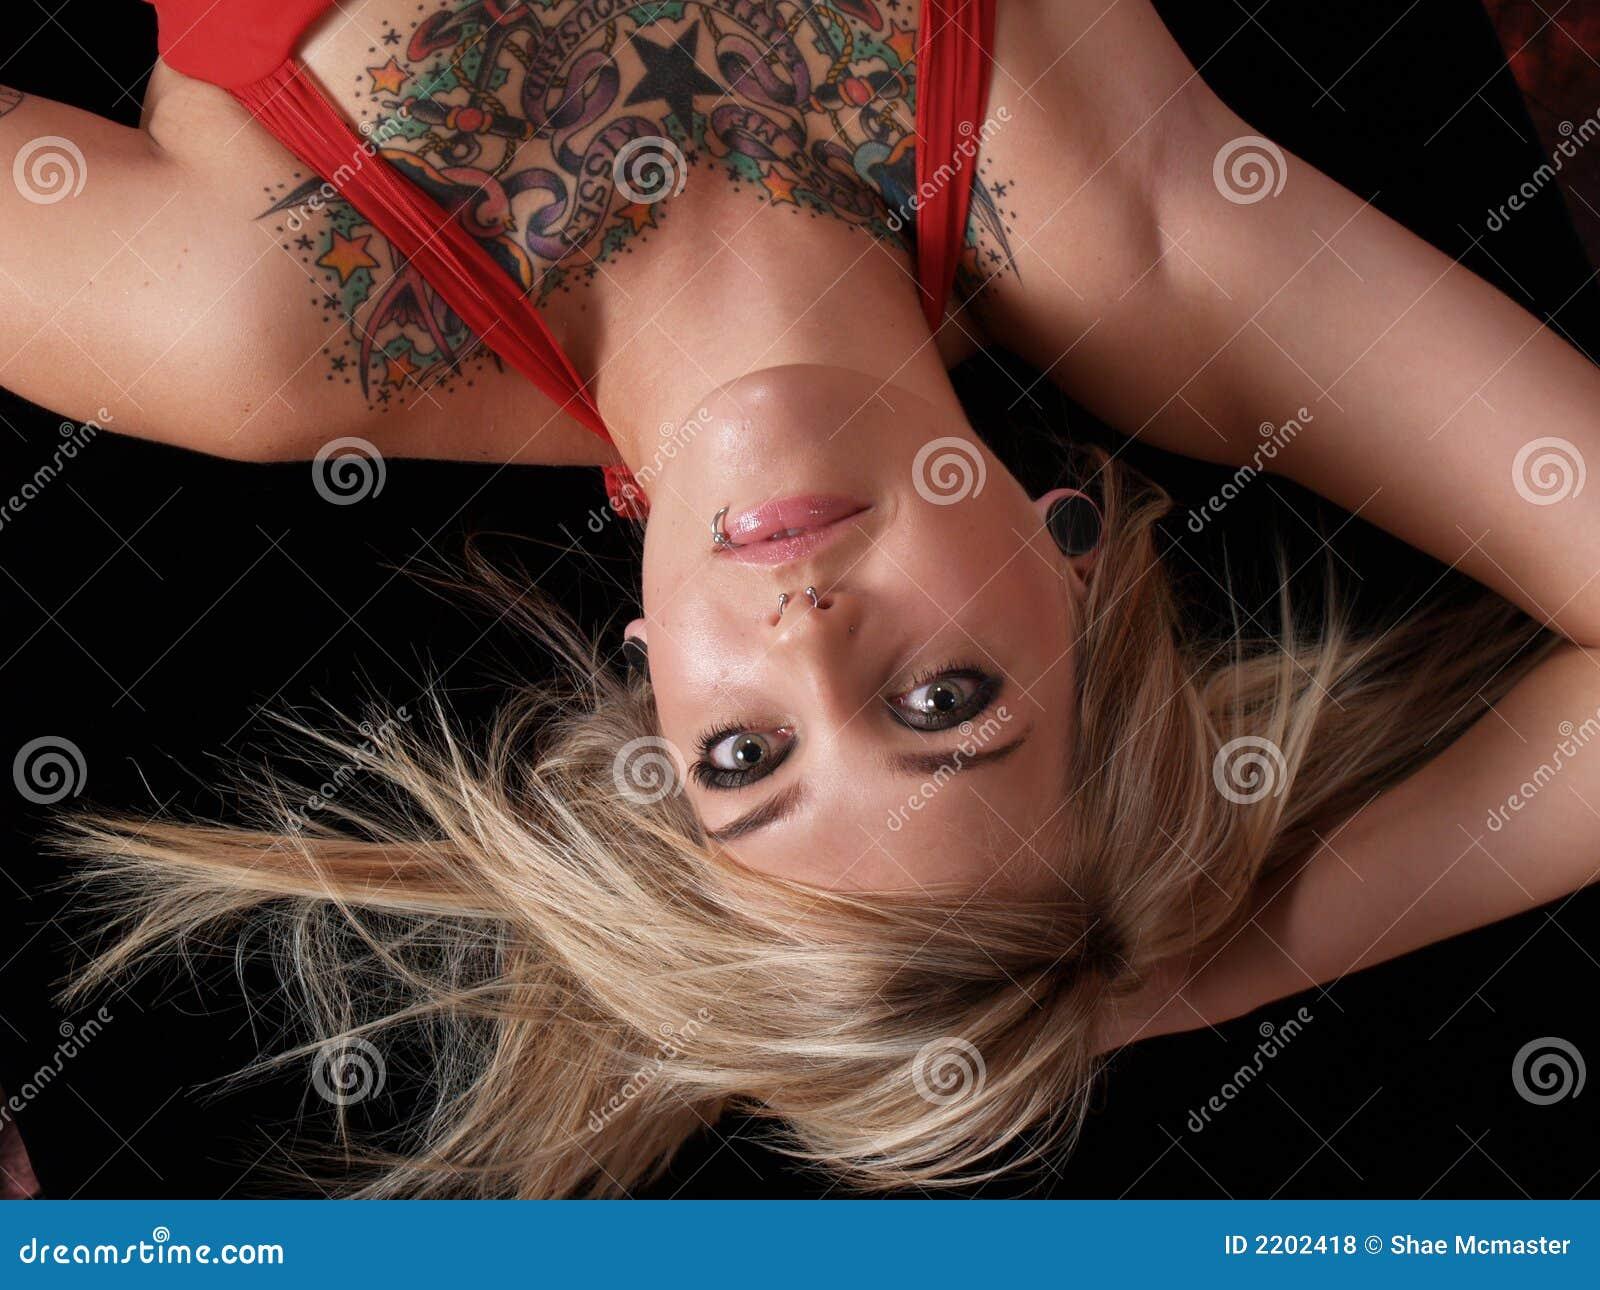 Jon Hamm various posing pics